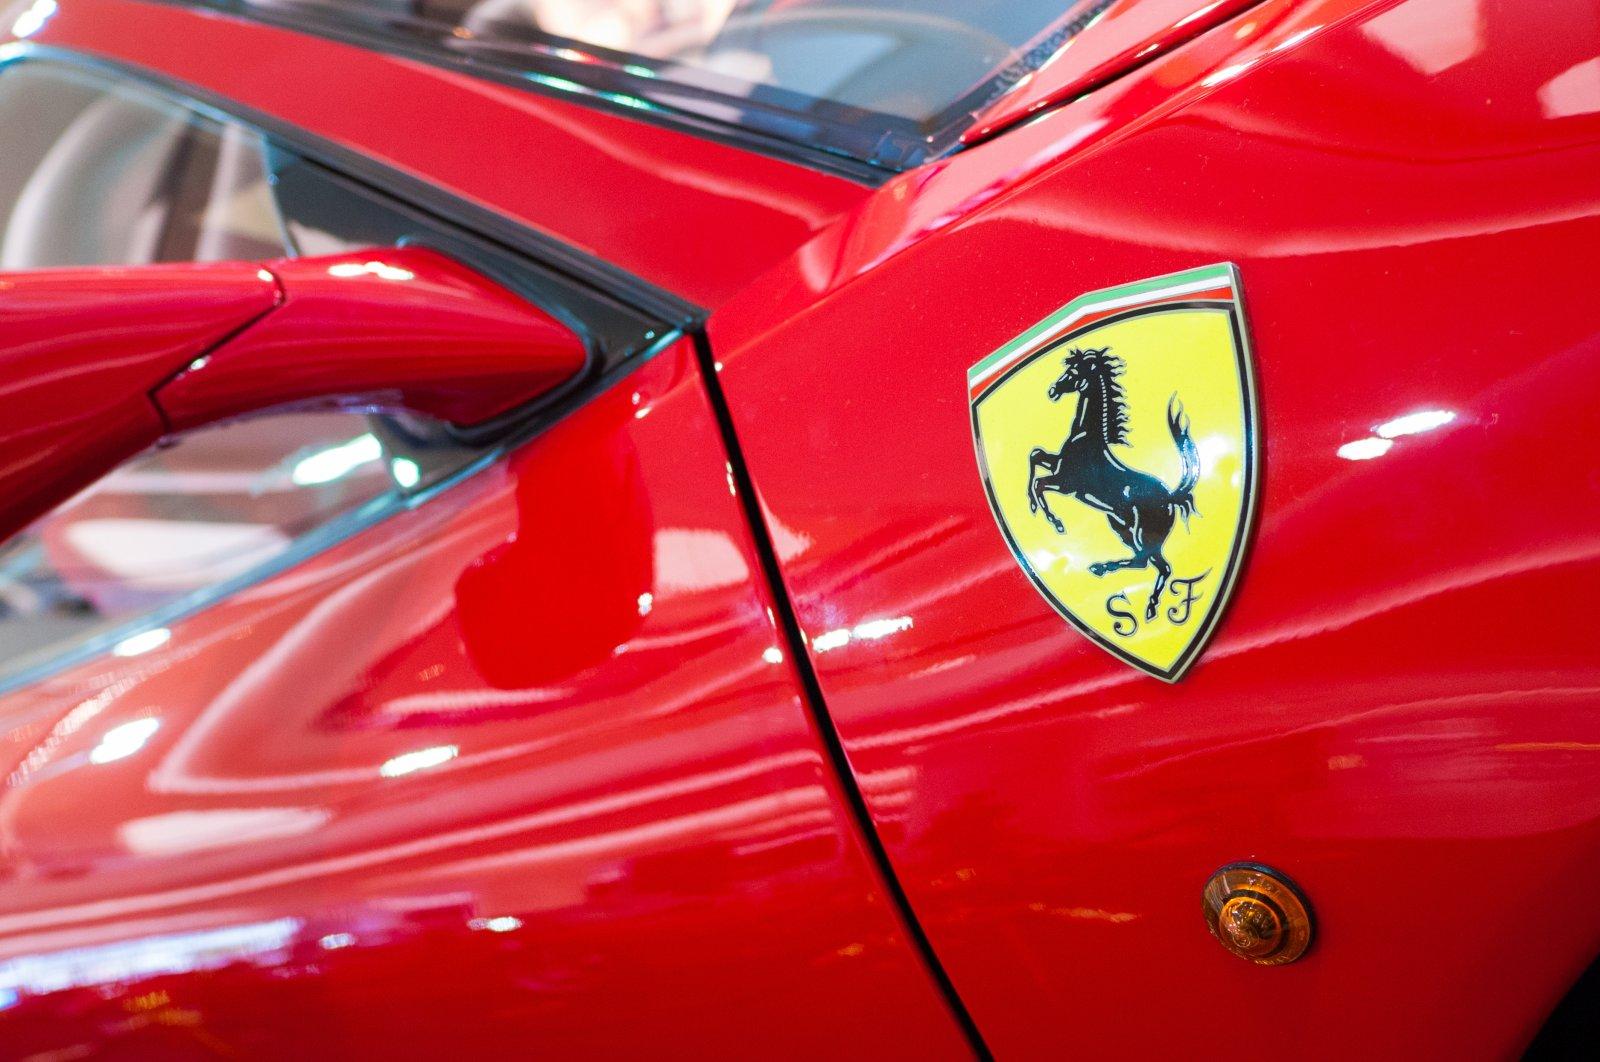 Logo of Ferrari on the sports car. (Shutterstock Photo)